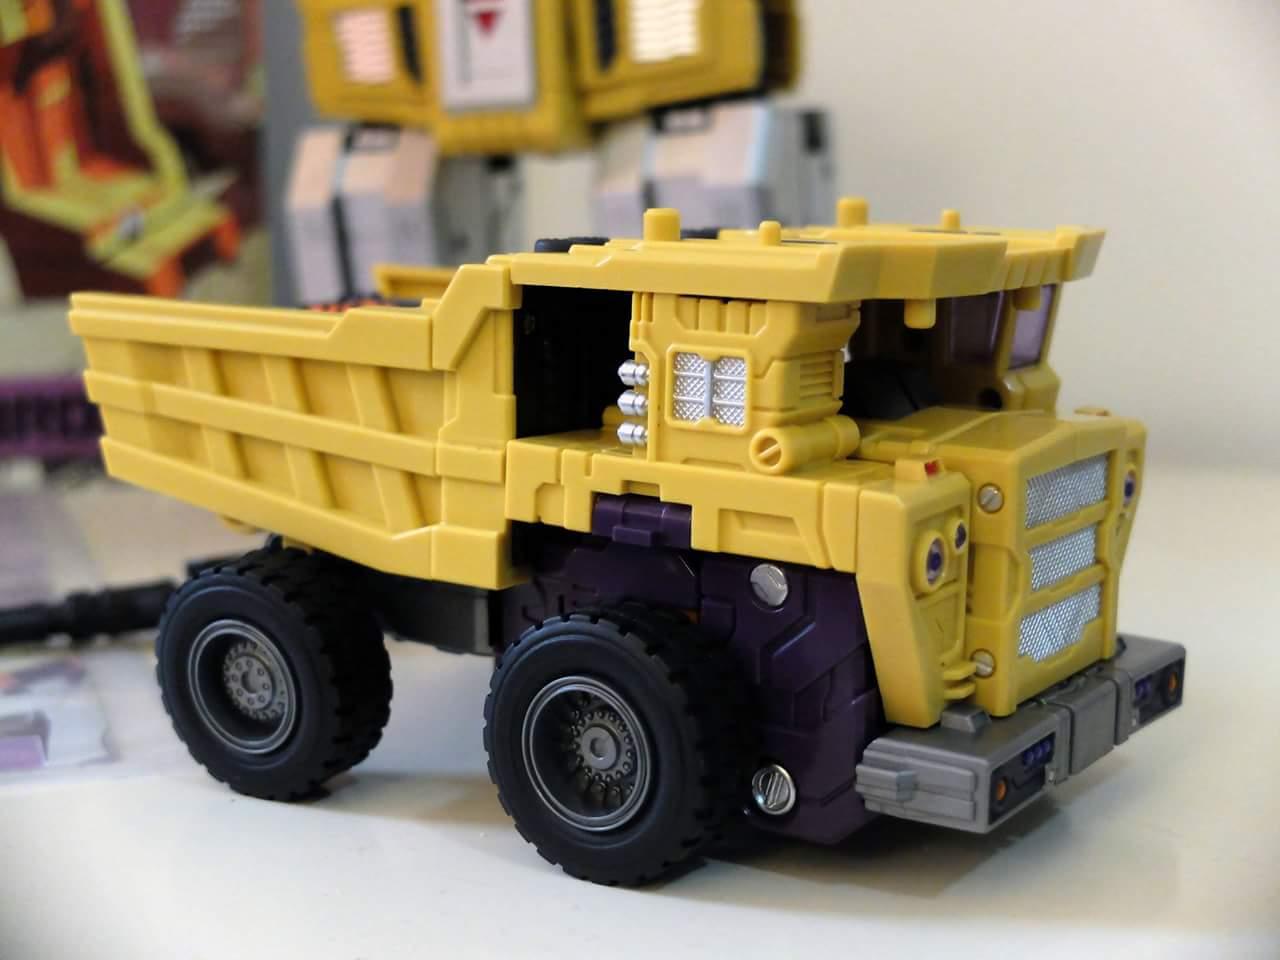 [Toyworld] Produit Tiers - Jouet TW-C Constructor aka Devastator/Dévastateur (Version vert G1 et jaune G2) - Page 8 XSeCIJL3